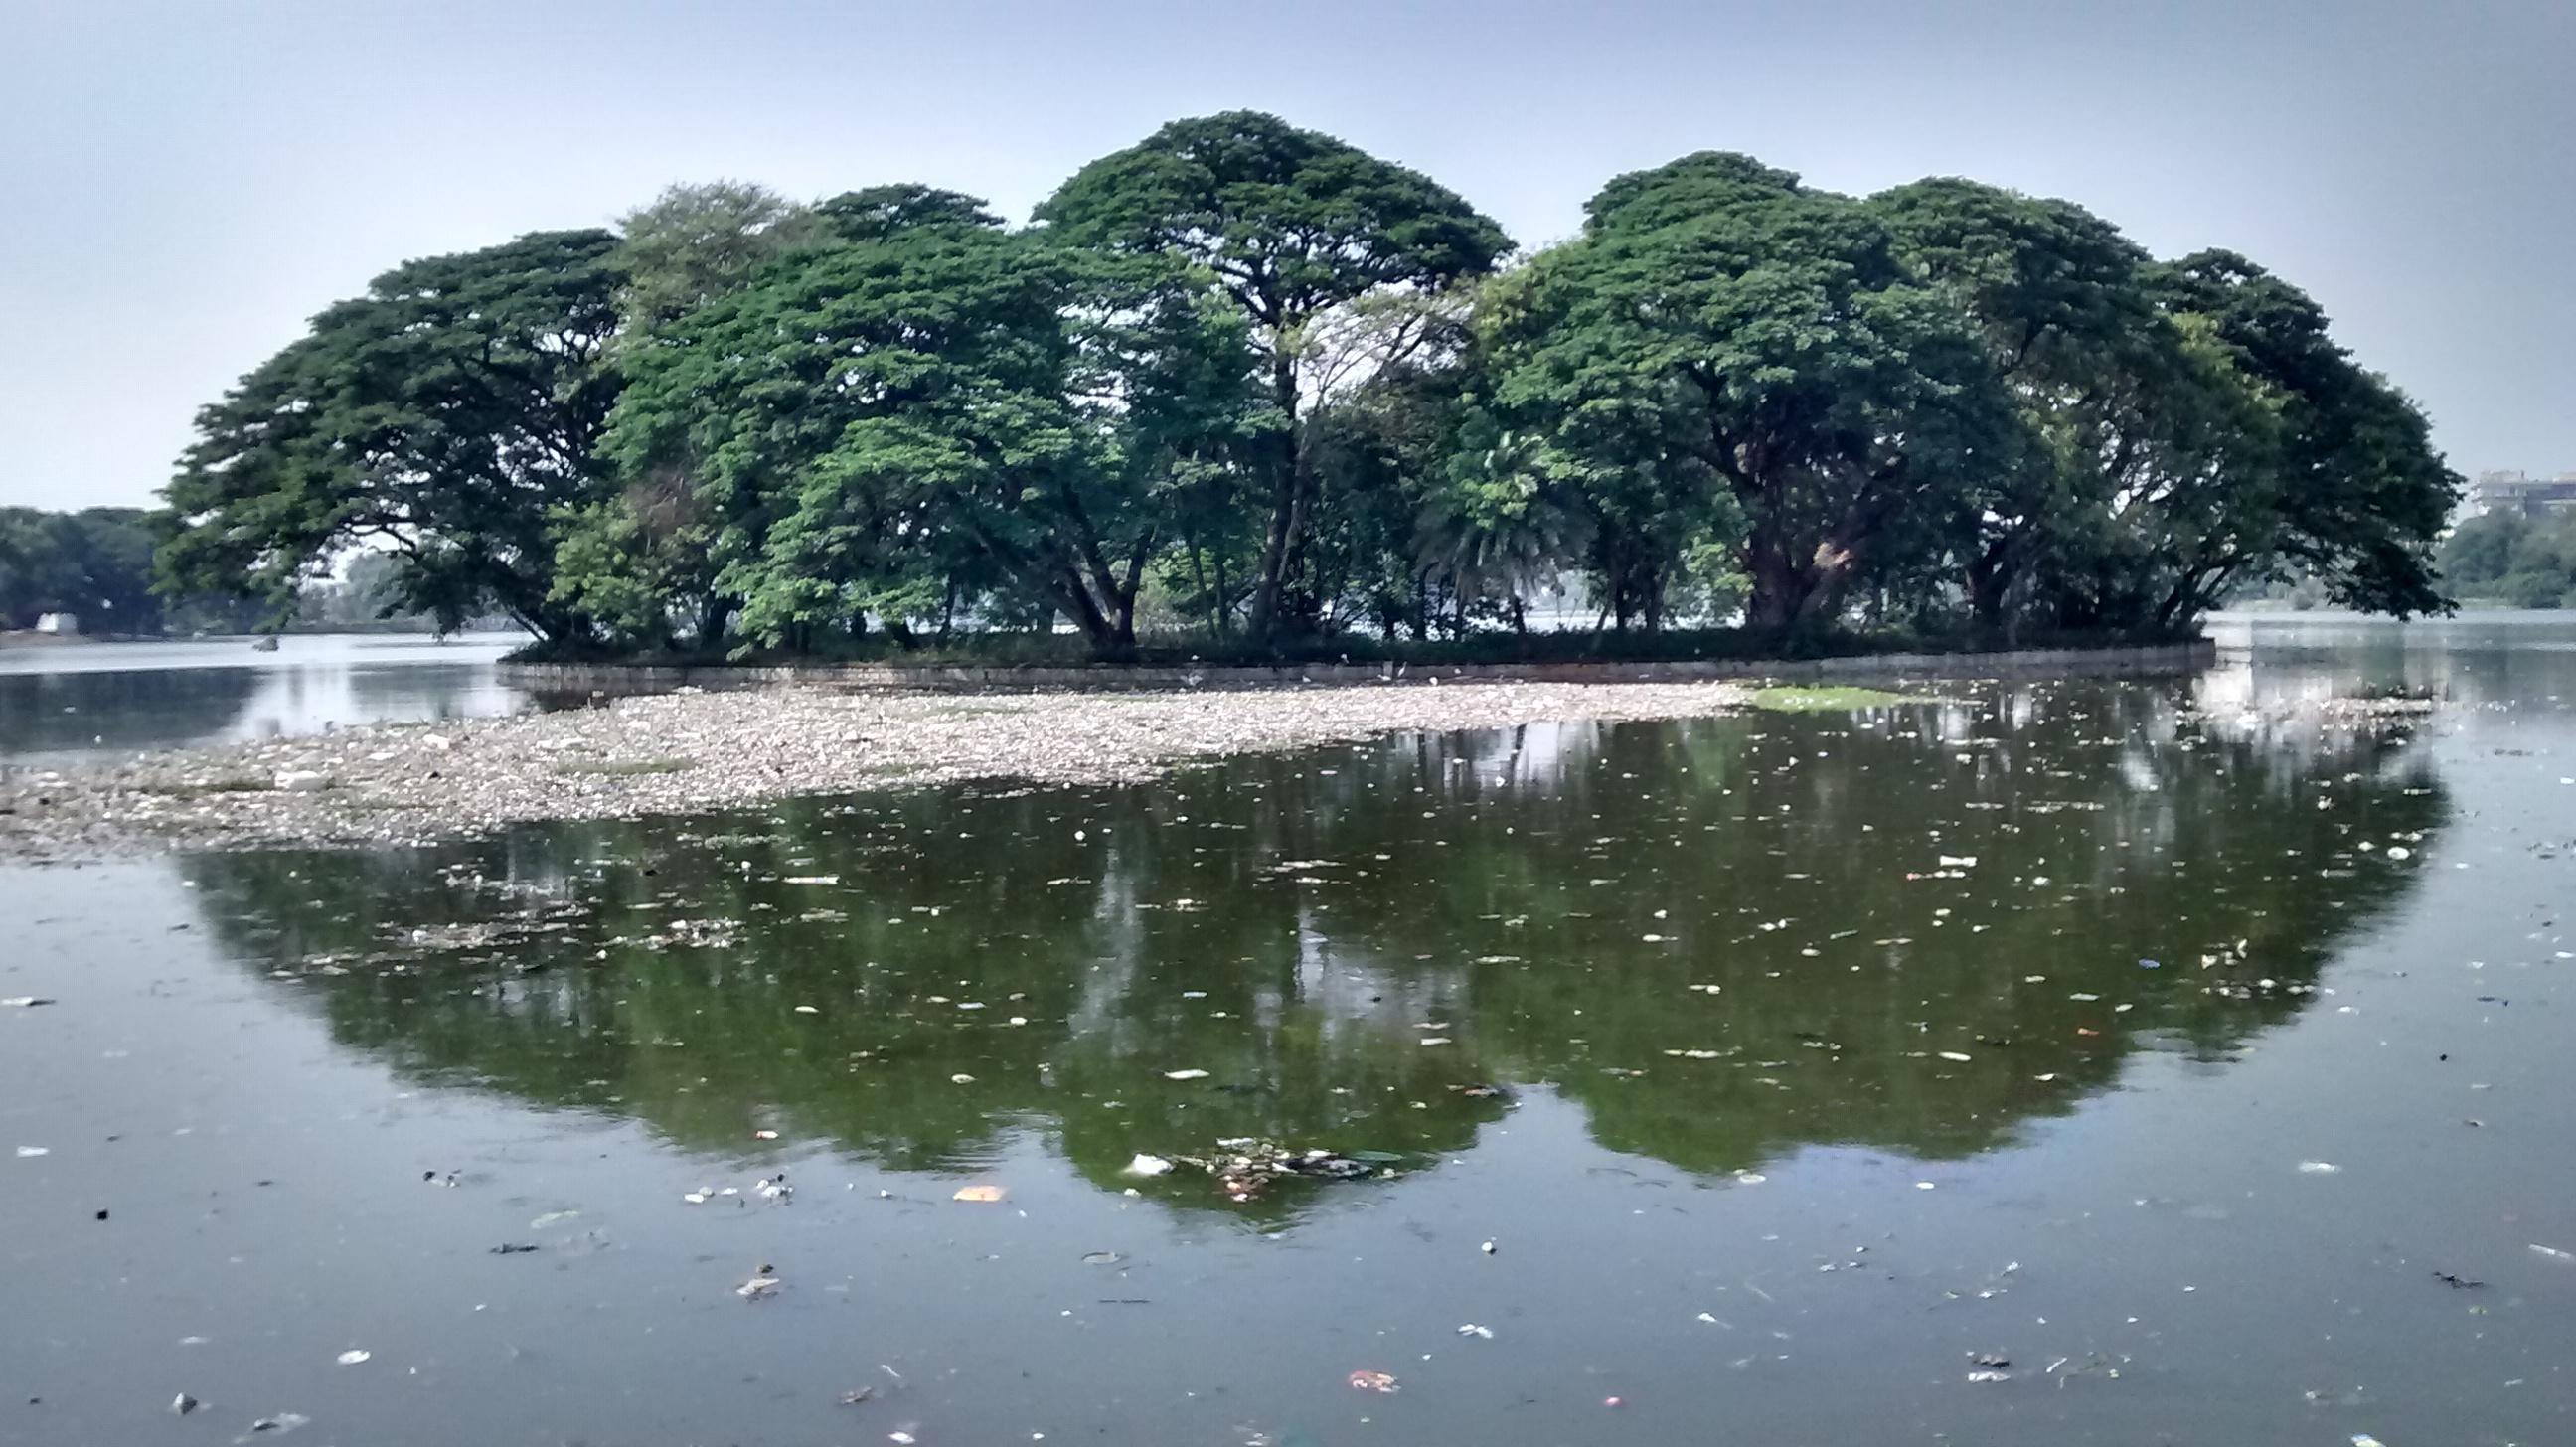 A view of polluted halasuru lake